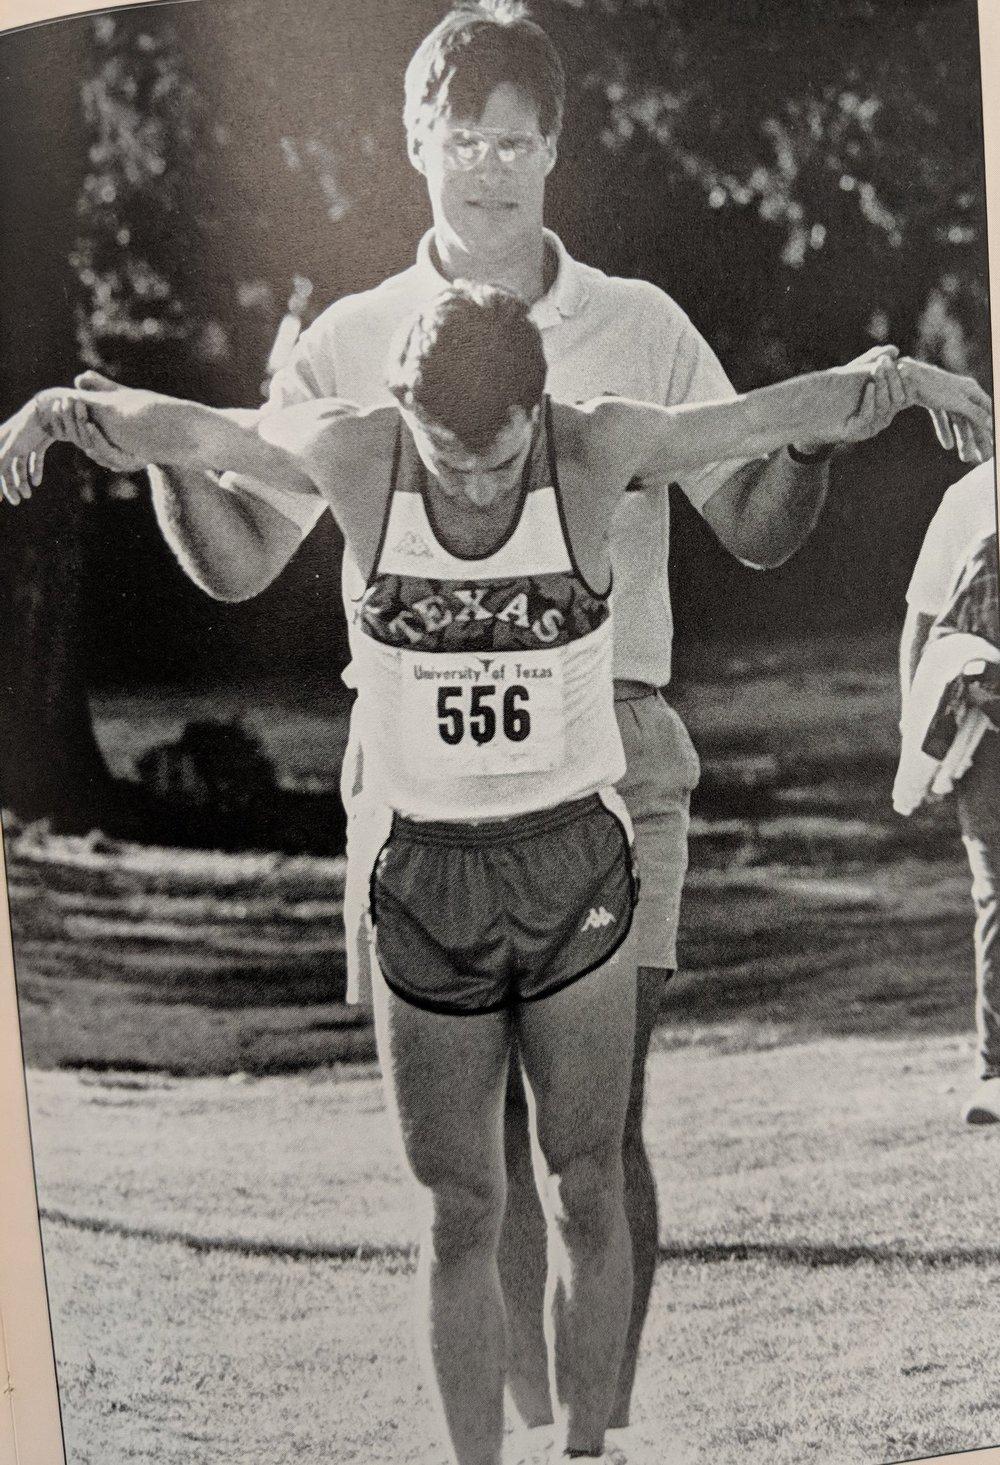 Trainer helping athlete